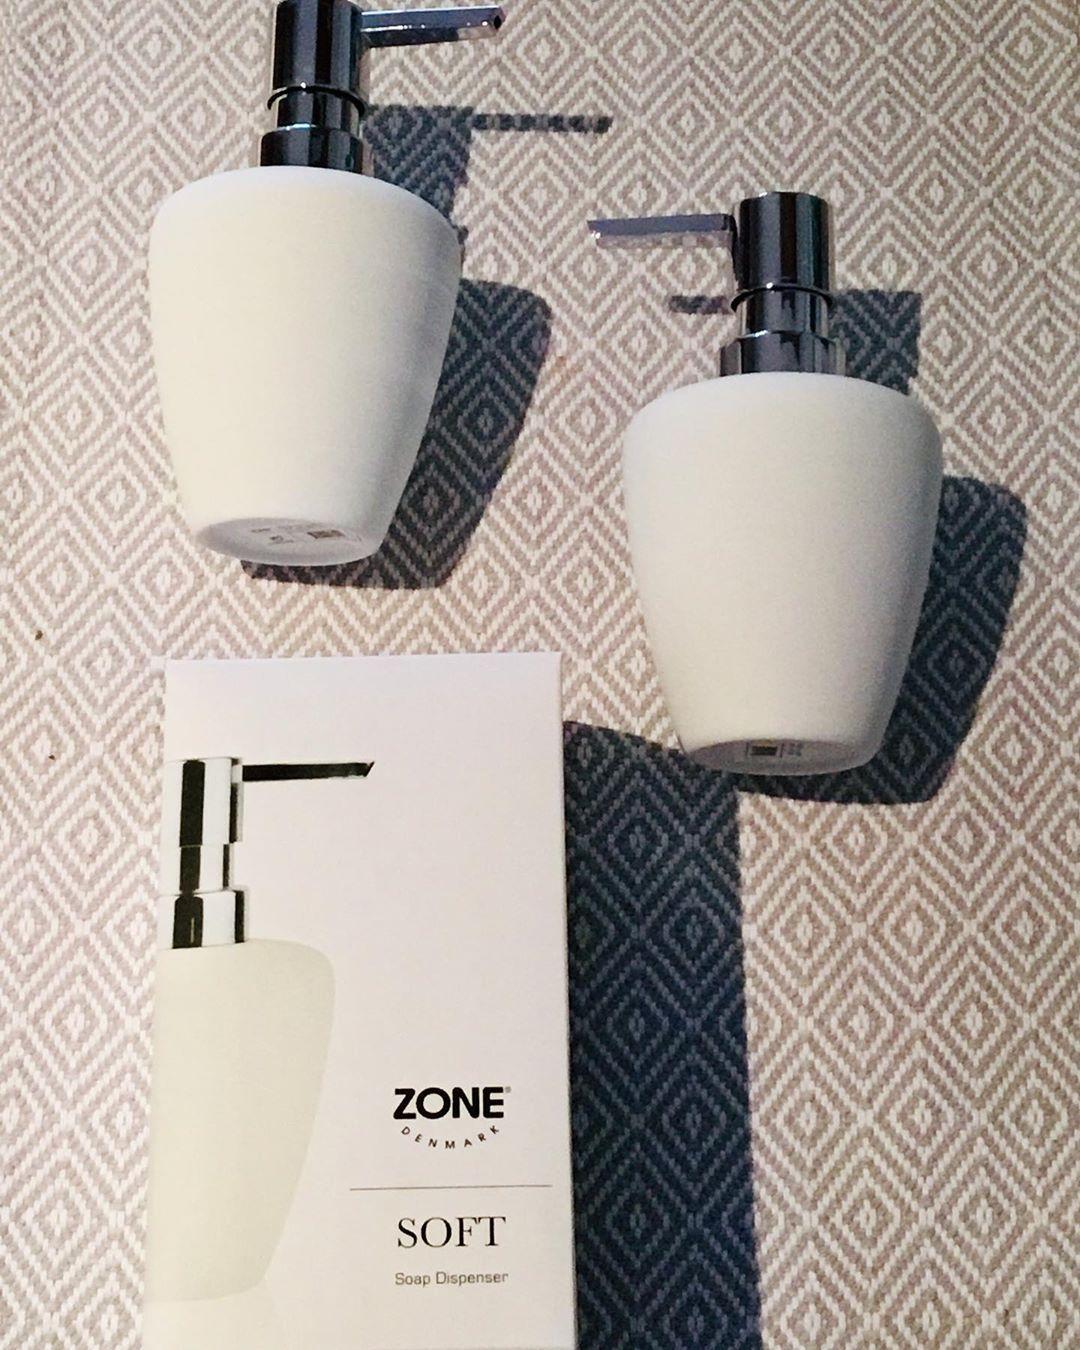 Willkommen Zuhause Bzw Im Bad Welcome Home New Addition To The Bathroom Zonedenmark Soapdispenser Scandihome Scandibathroom Scandinaviandesign